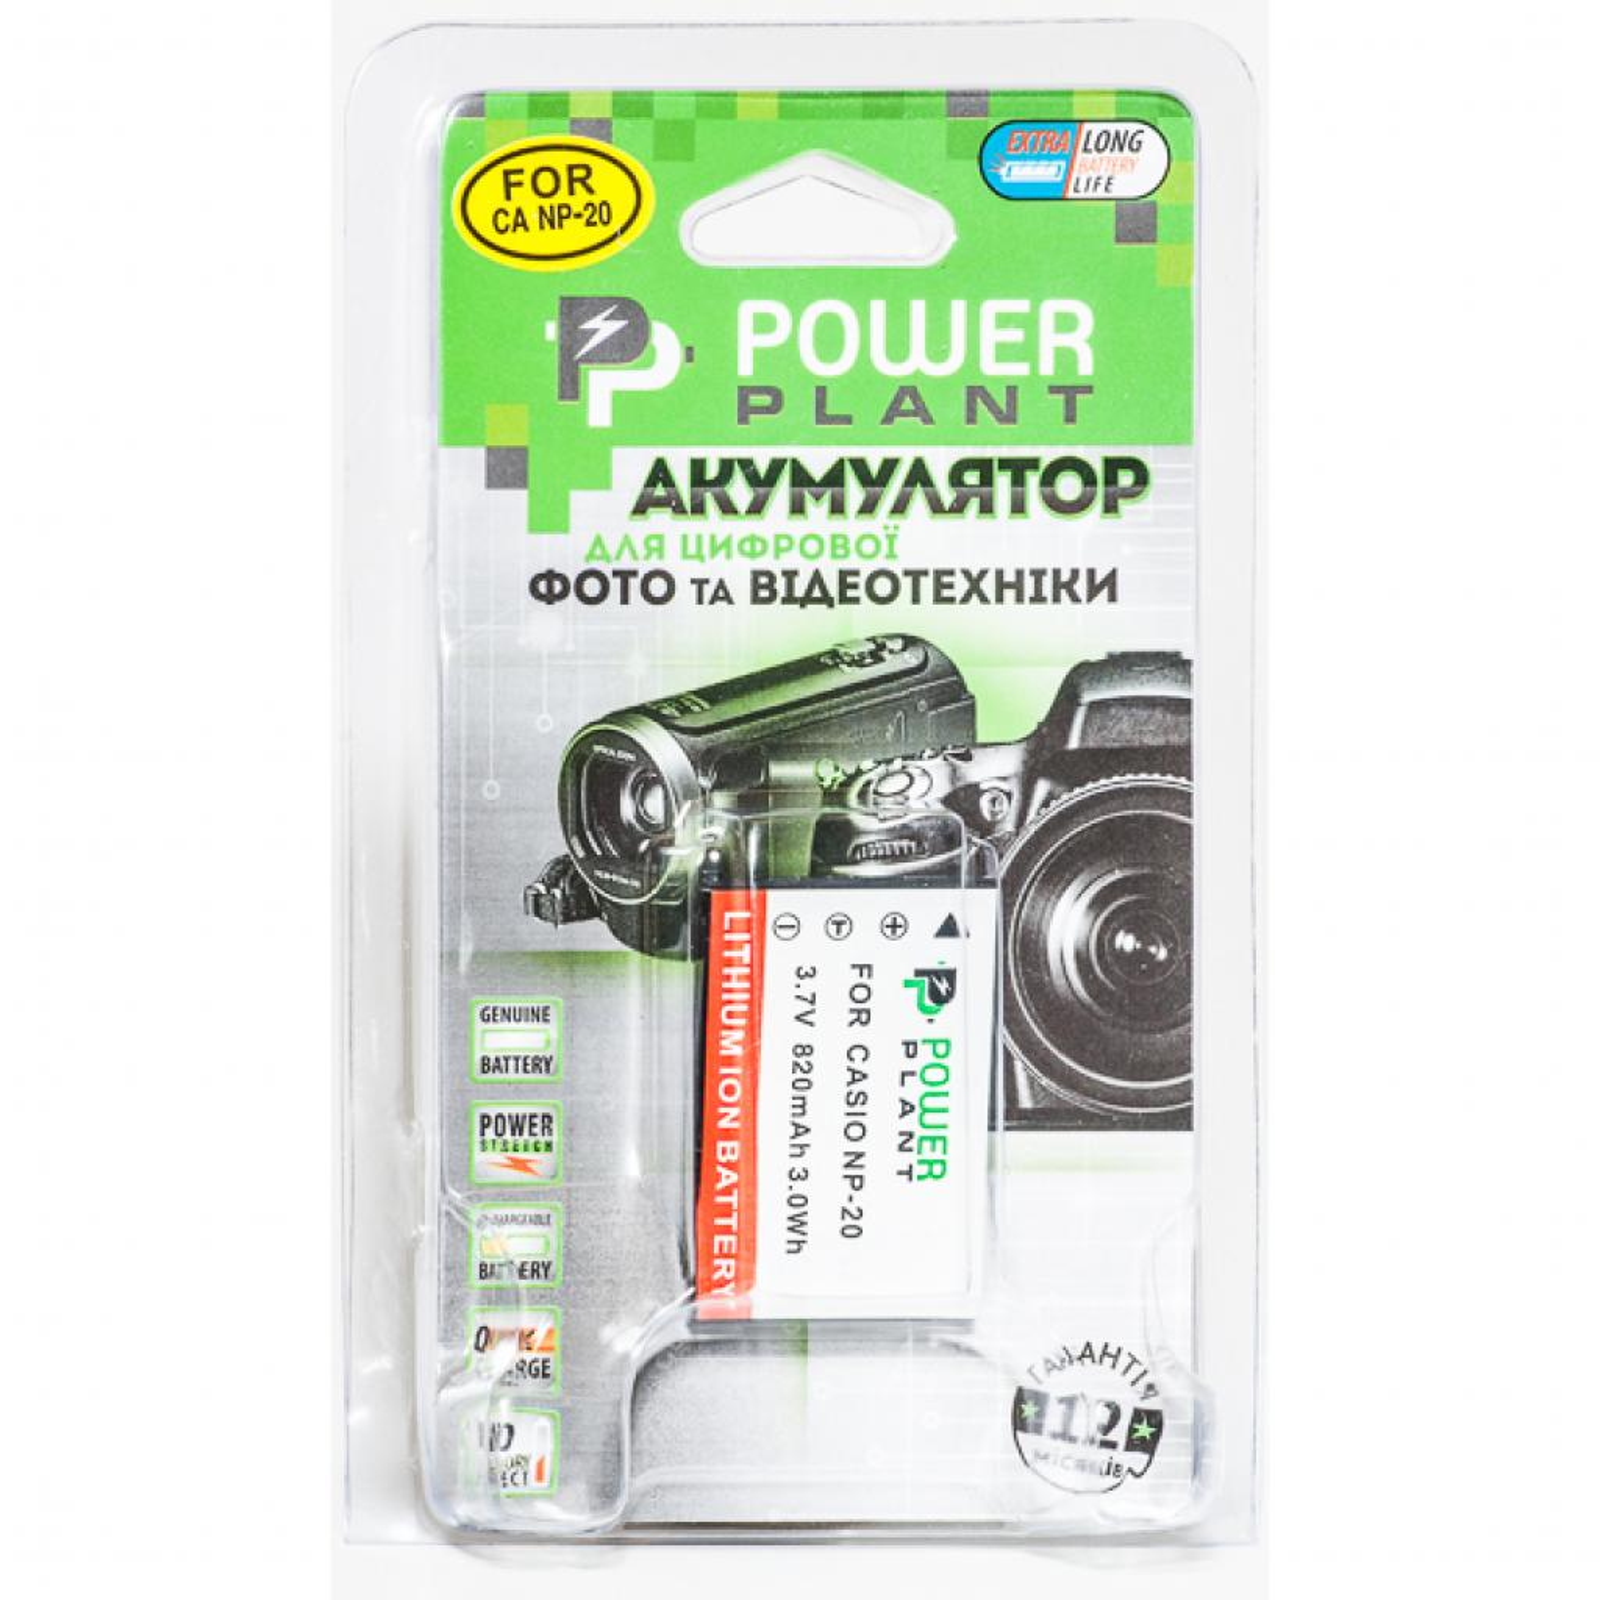 Аккумулятор к фото/видео PowerPlant Casio NP-20 (DV00DV1042) изображение 3